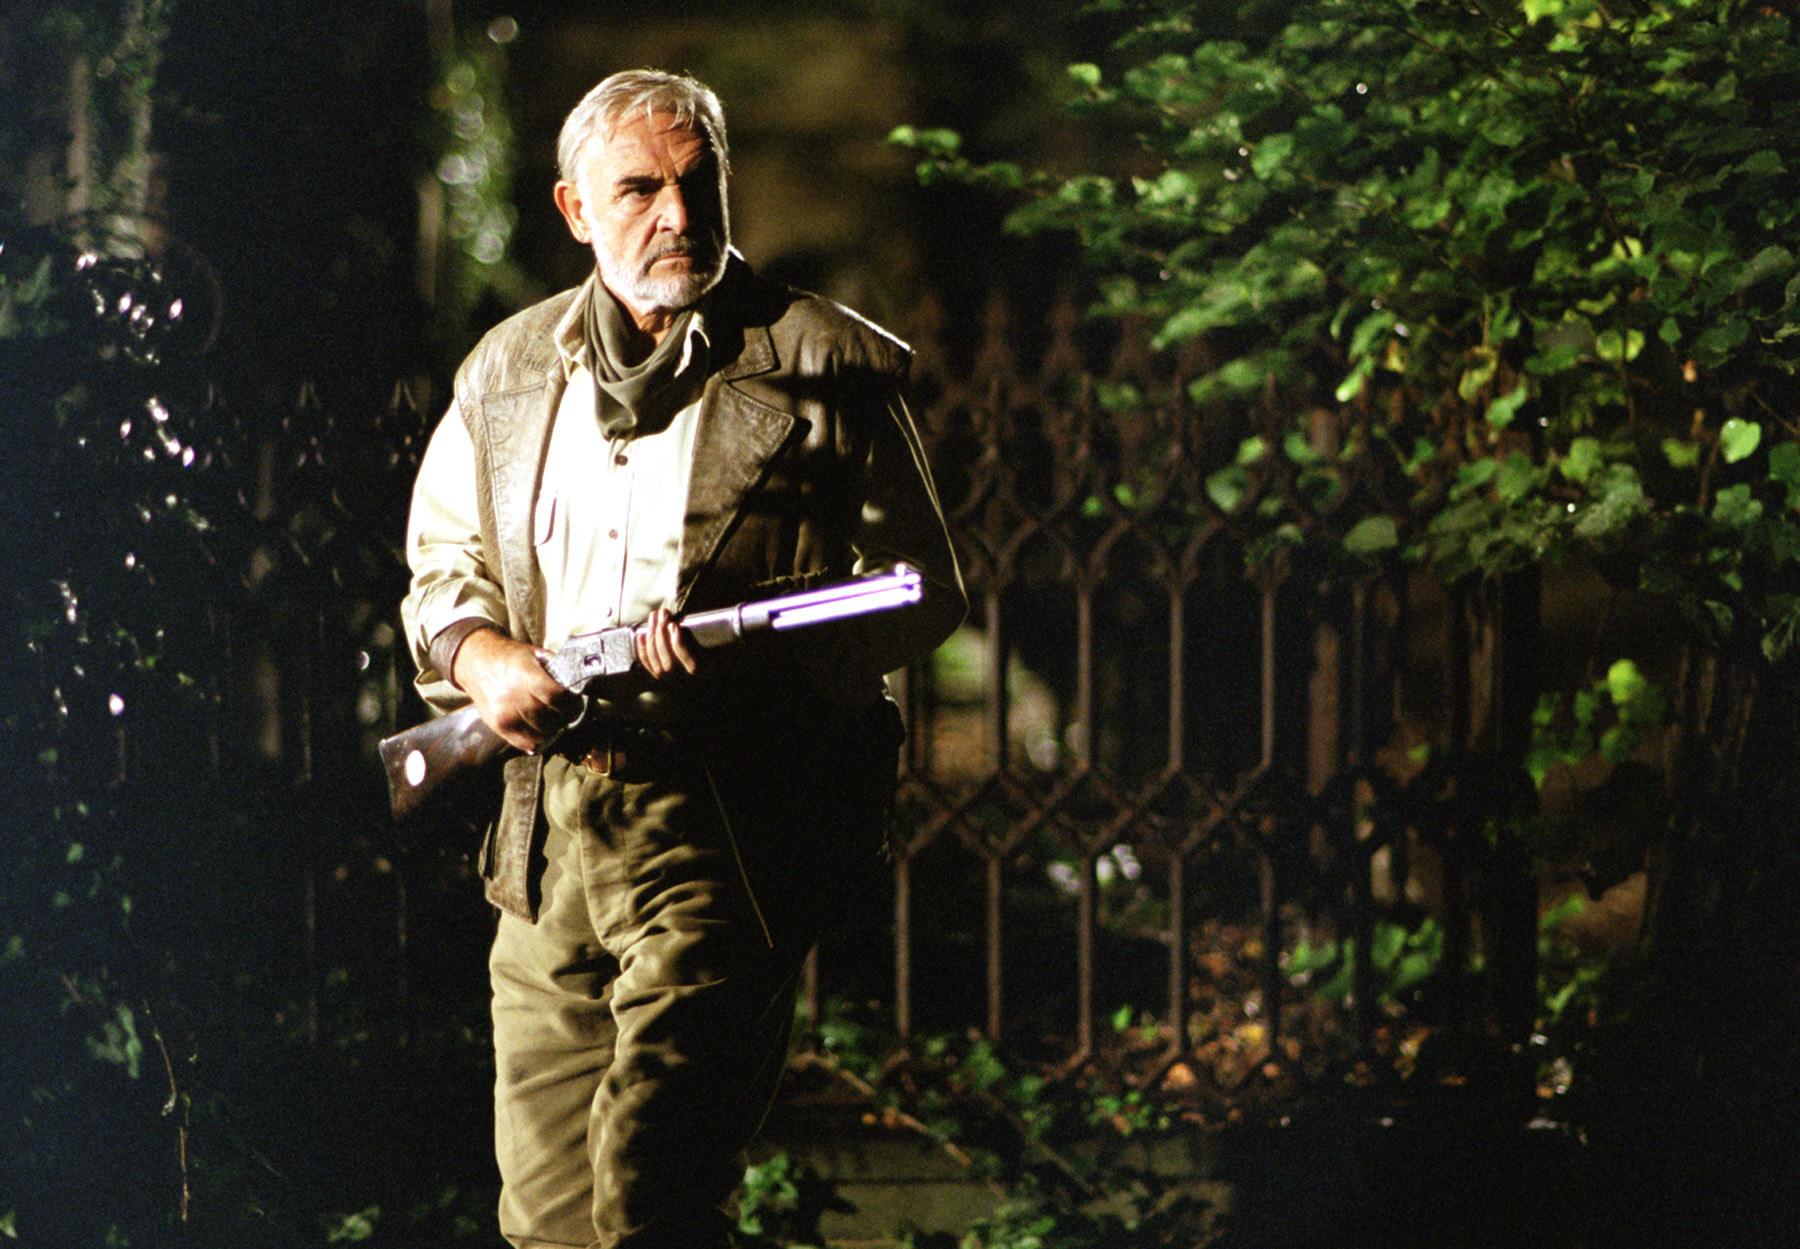 Allan readies his rifle